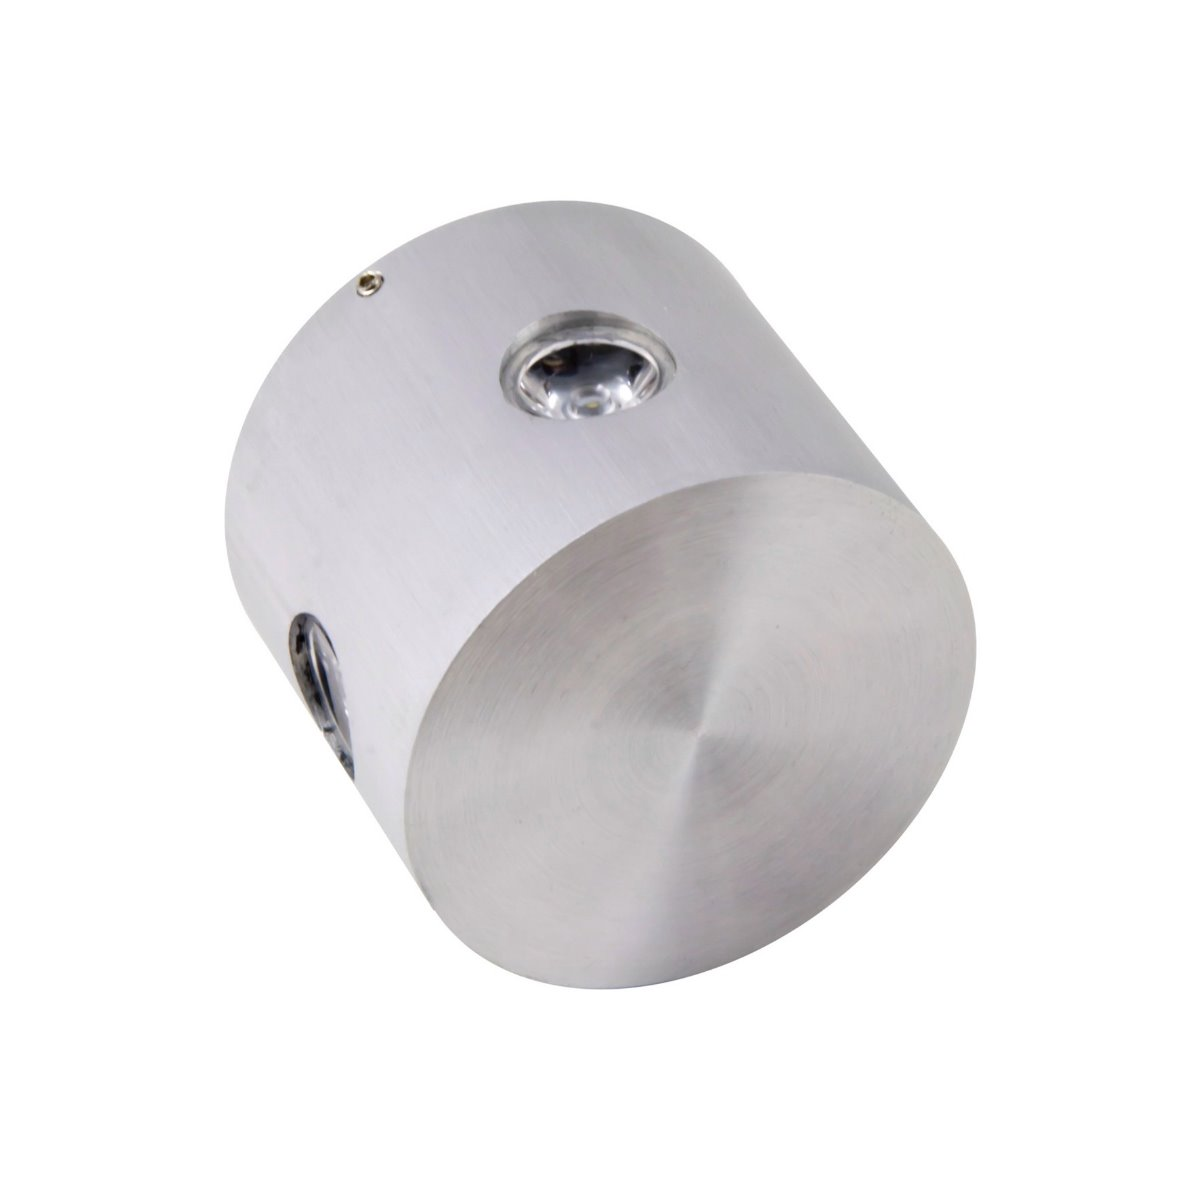 wandlampe wandleuchte wand lampe leuchte spot strahler. Black Bedroom Furniture Sets. Home Design Ideas